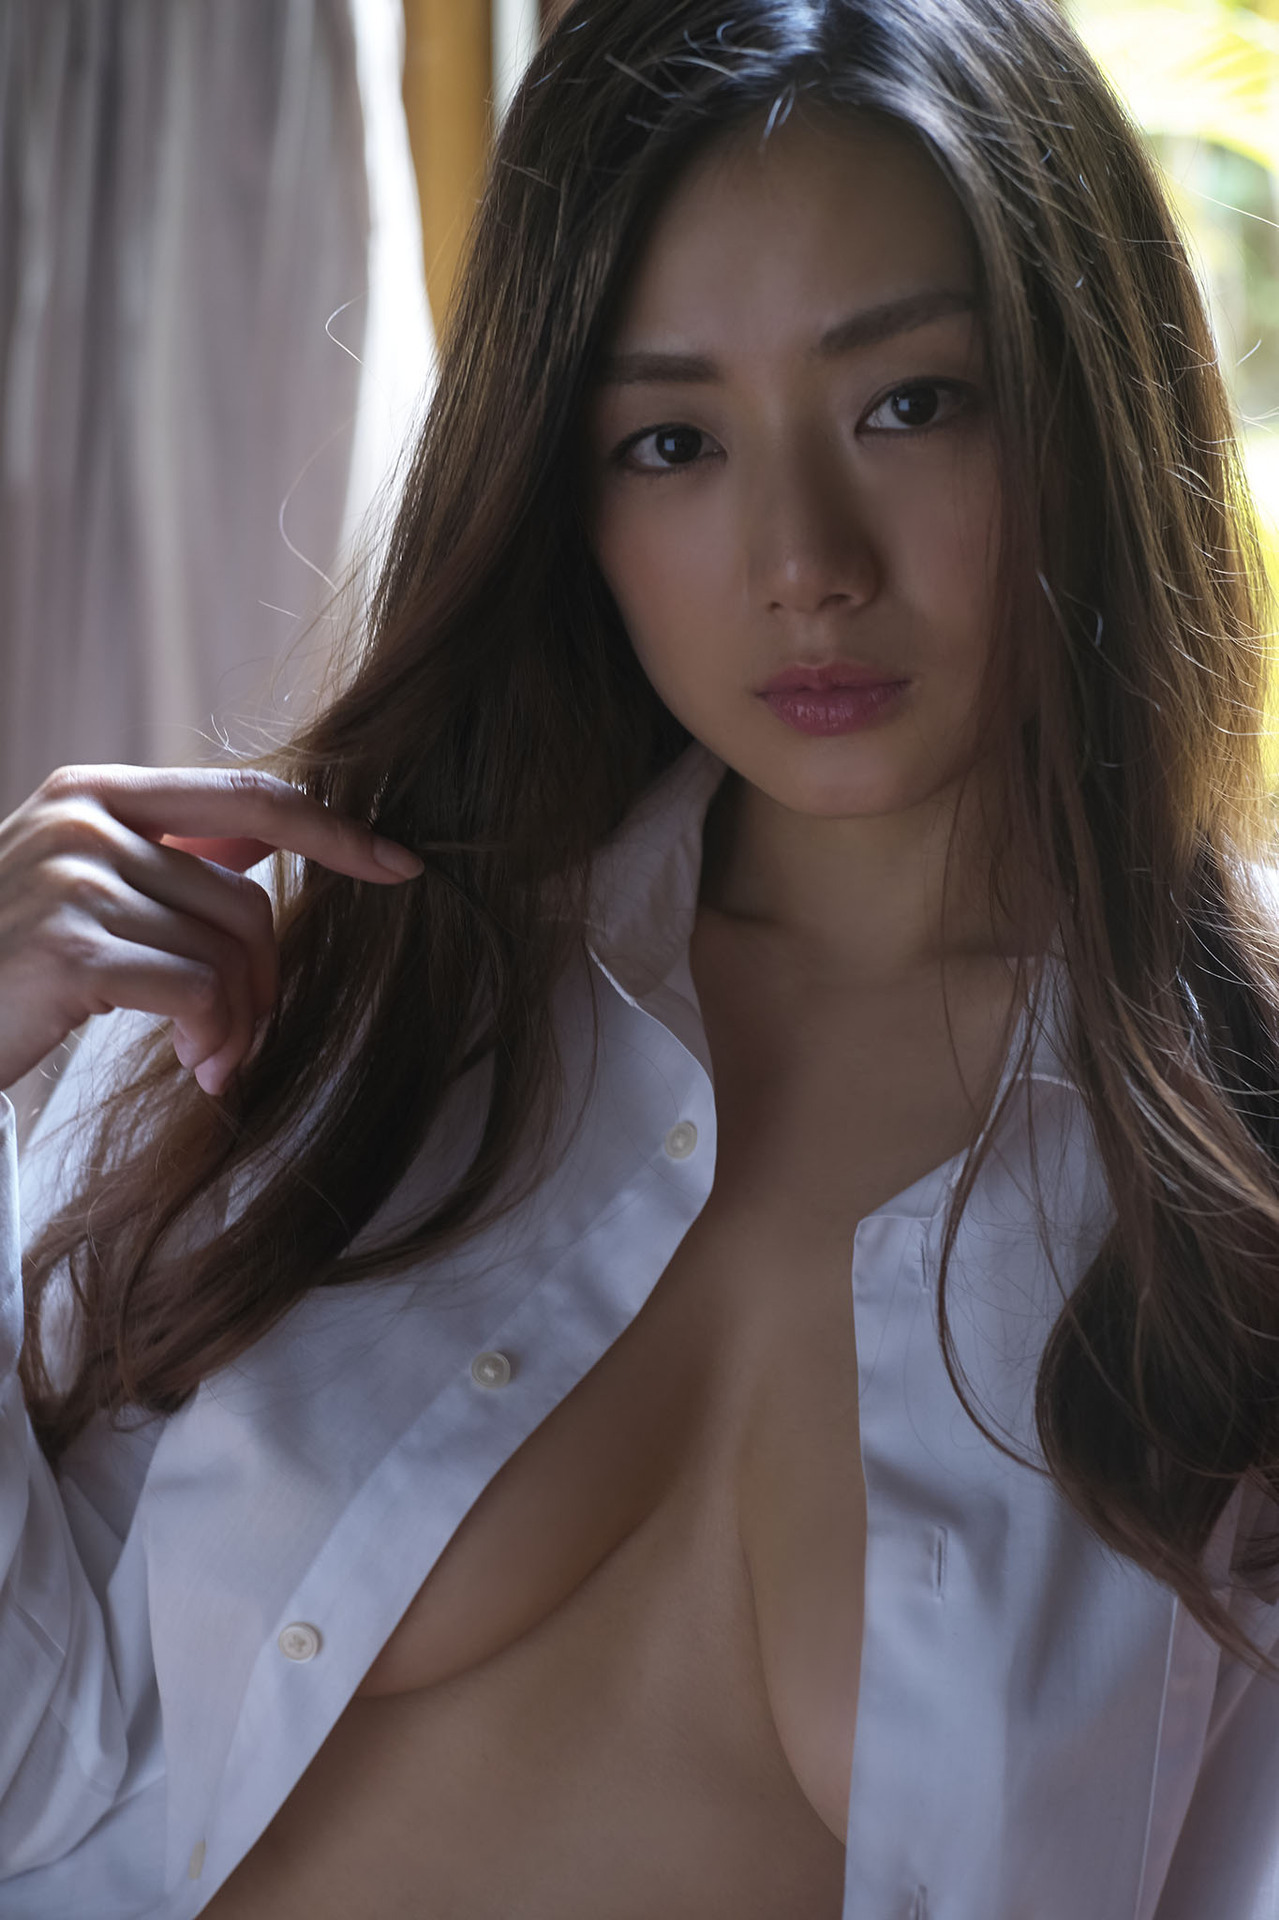 片山萌美 Poker Face 00014